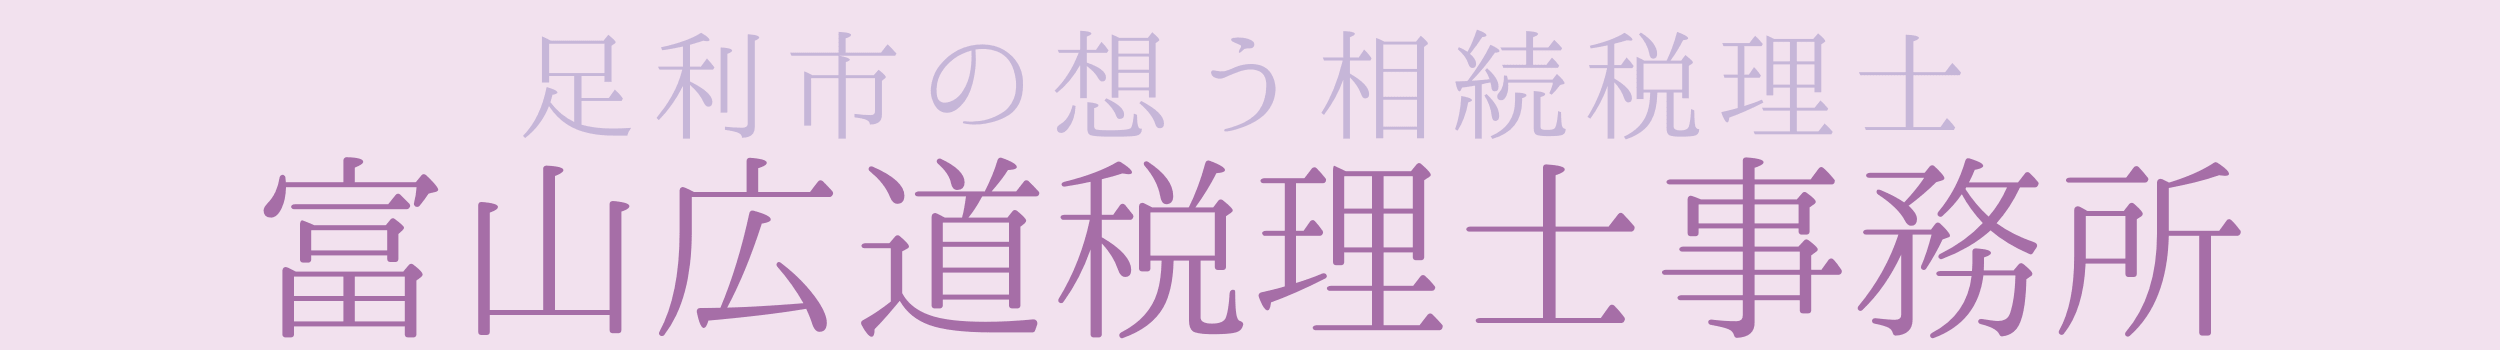 【足利市の想う相続税理士】富山広道税理士事務所